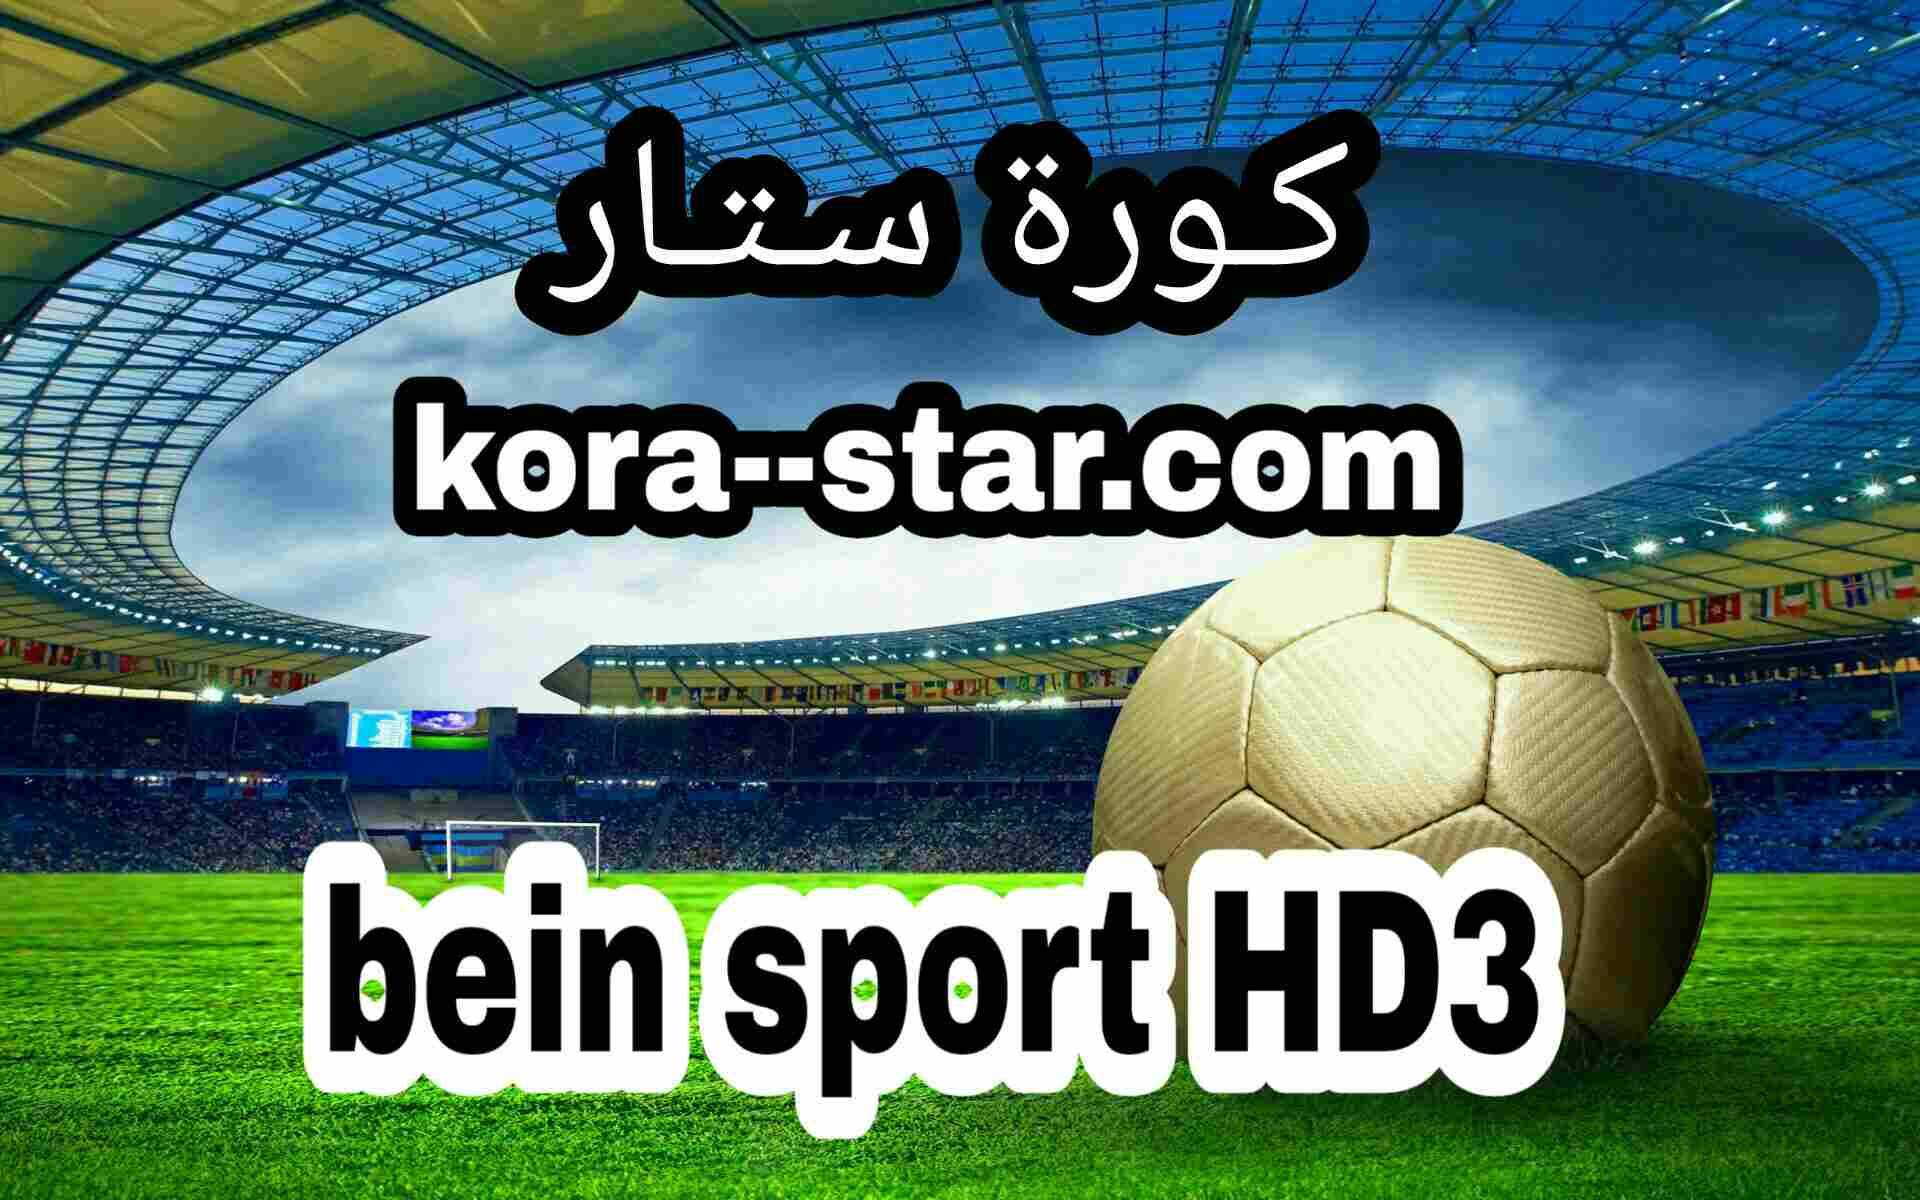 كورة جول مباشر بي ان سبورت 3 bien sports 3 kooora goal